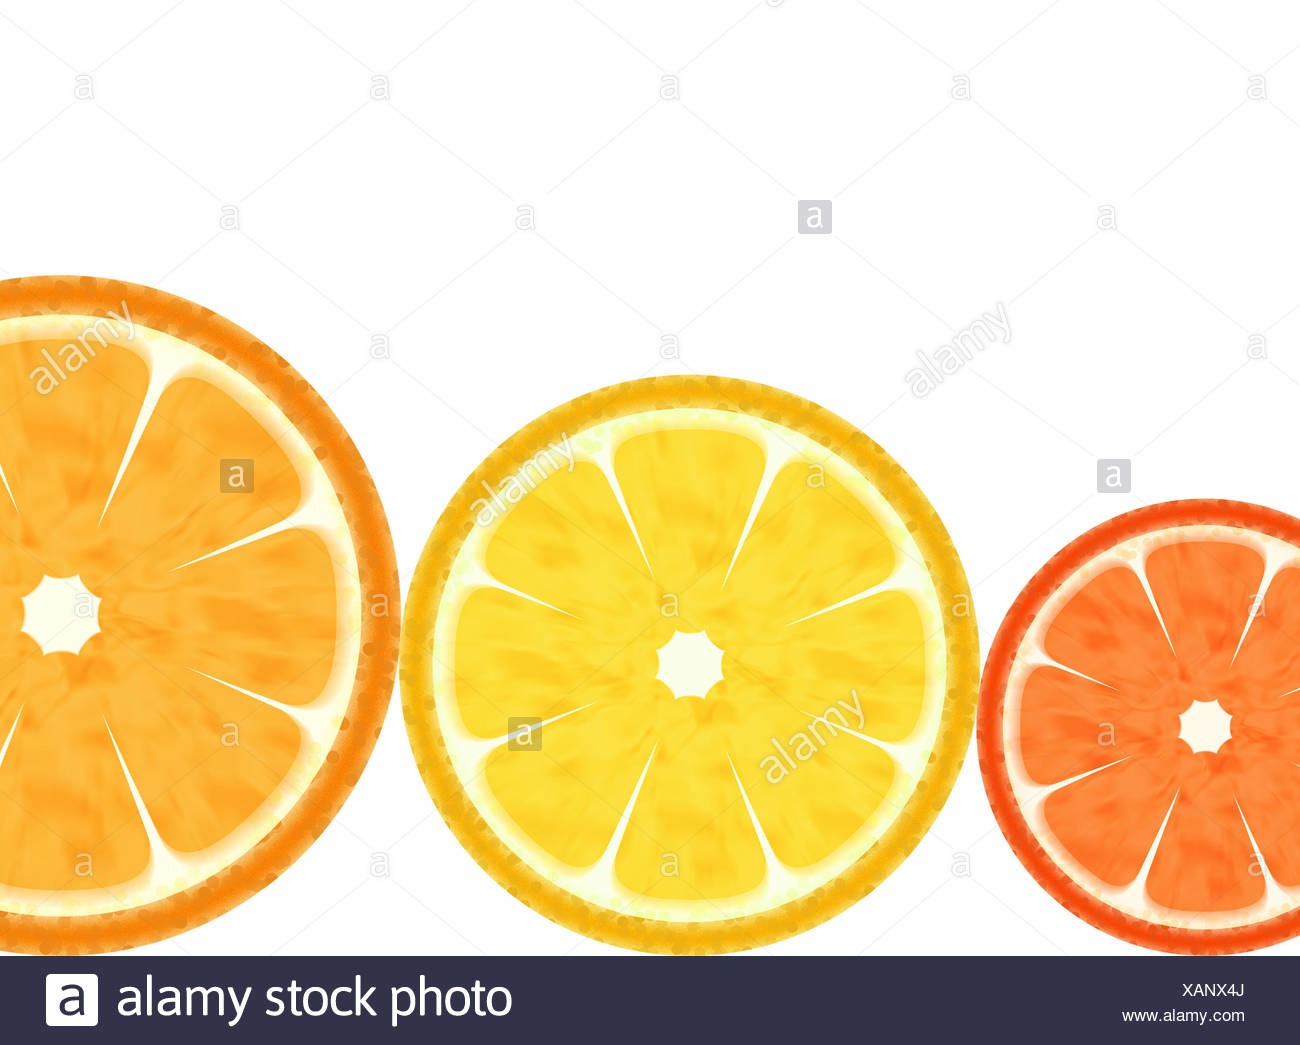 Orange Food Aliment Fruit Abstract Grapefruit Lemon Citron